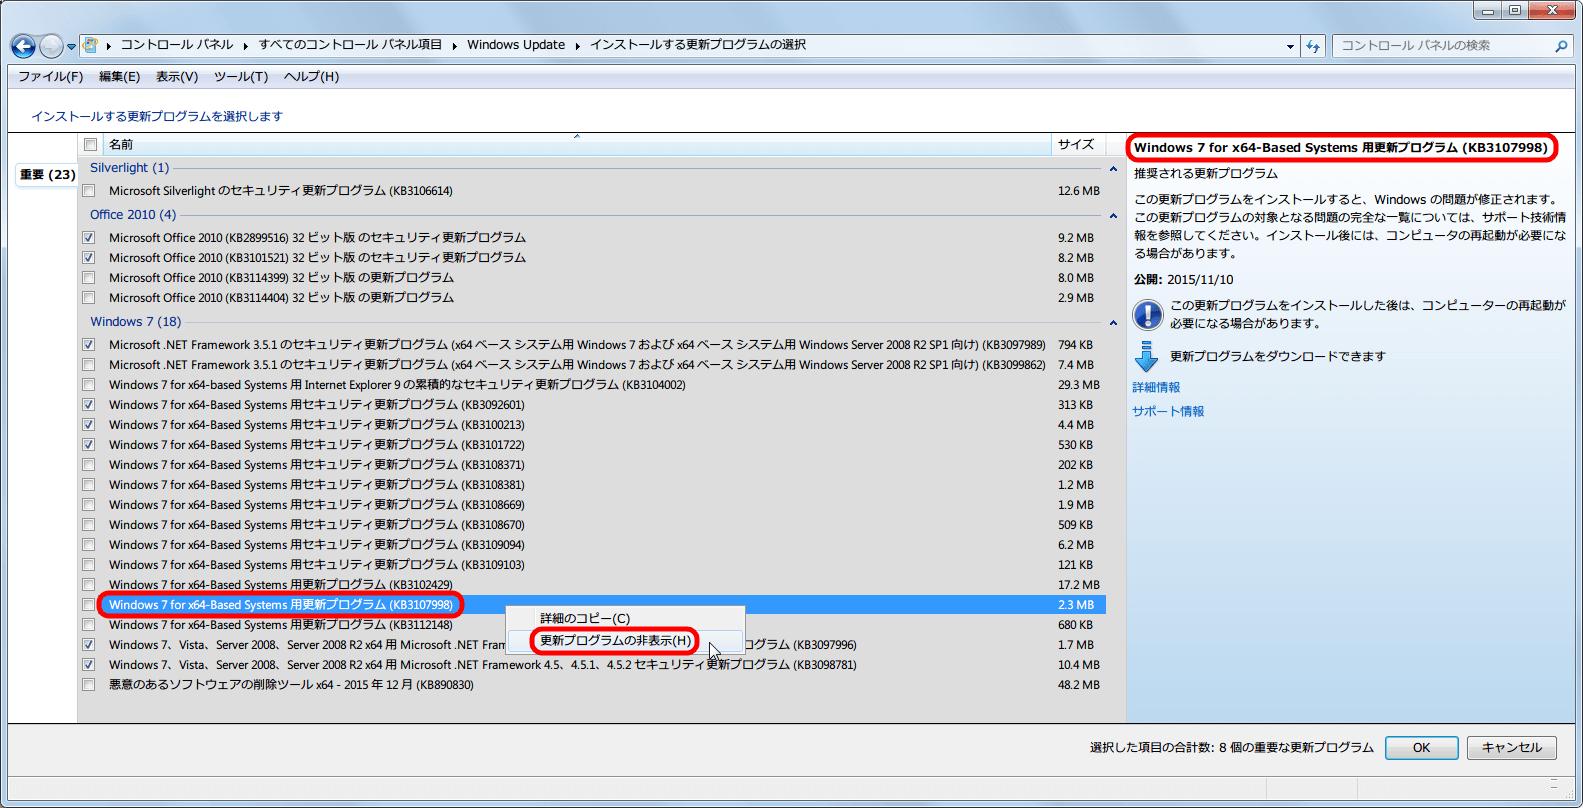 Windows Update 2015年11月分 KB3107998 更新プログラムの非表示